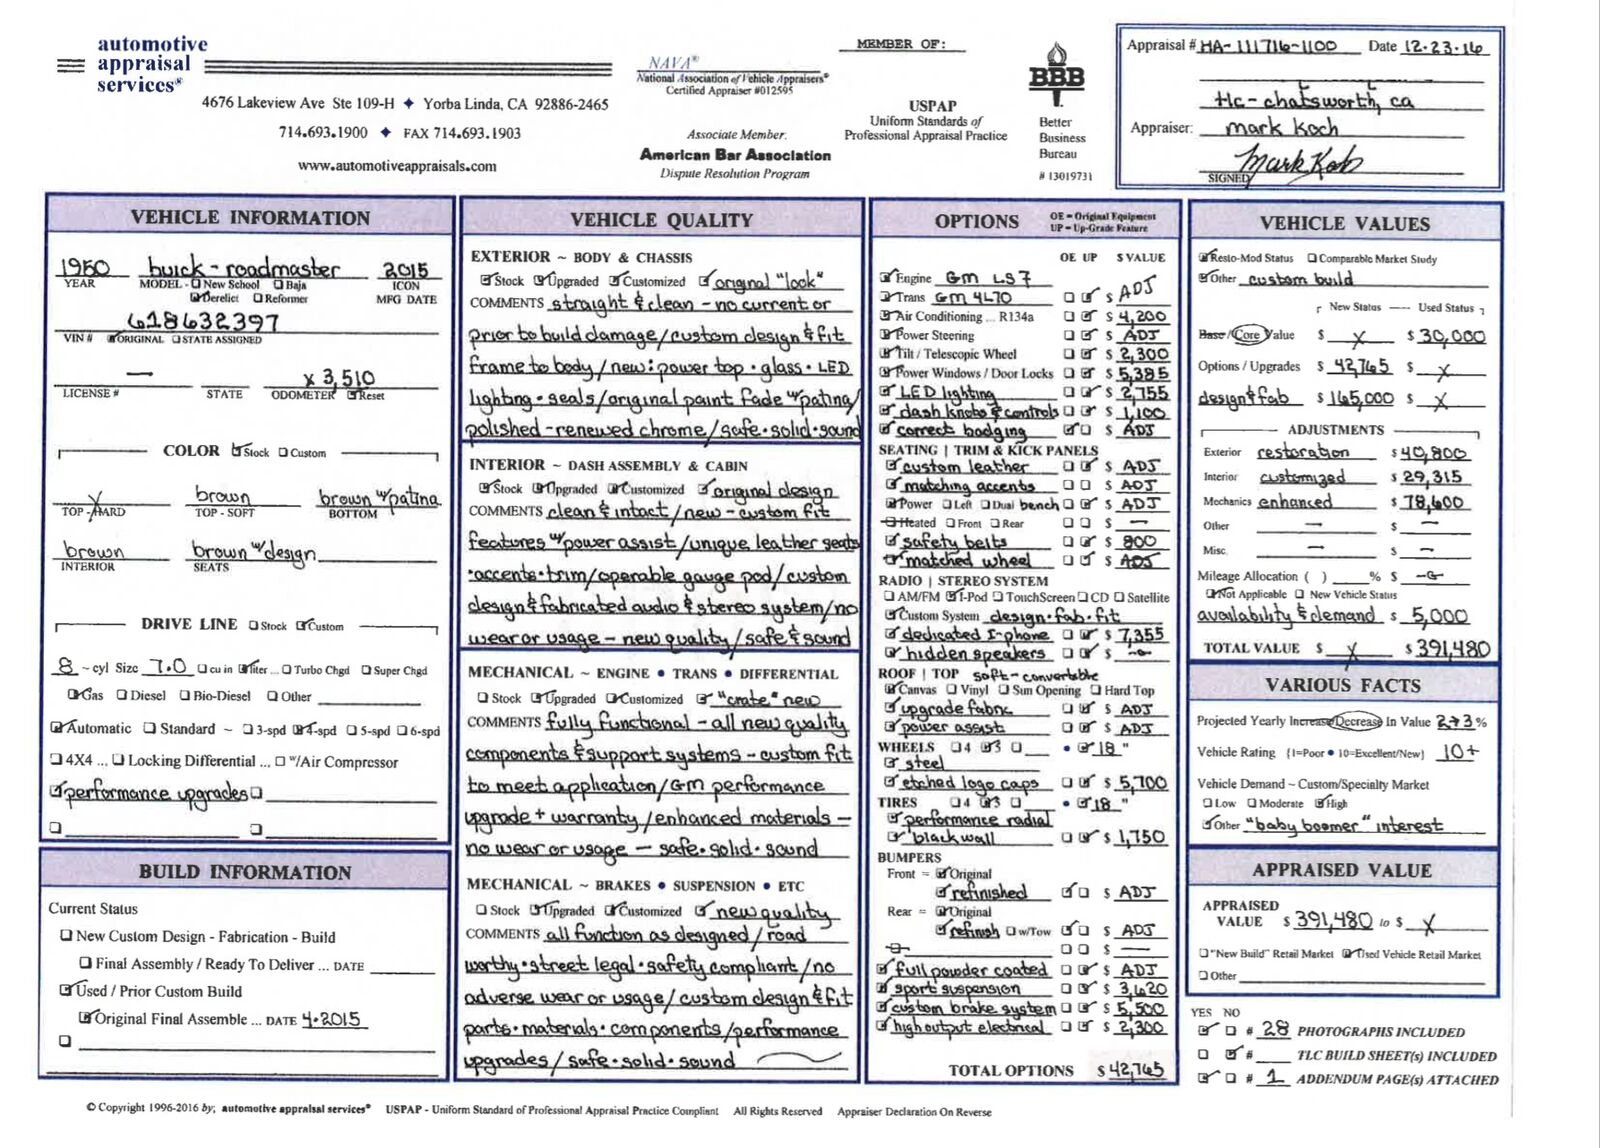 1950 Buick Roadmaster ICON Derelict appraisal